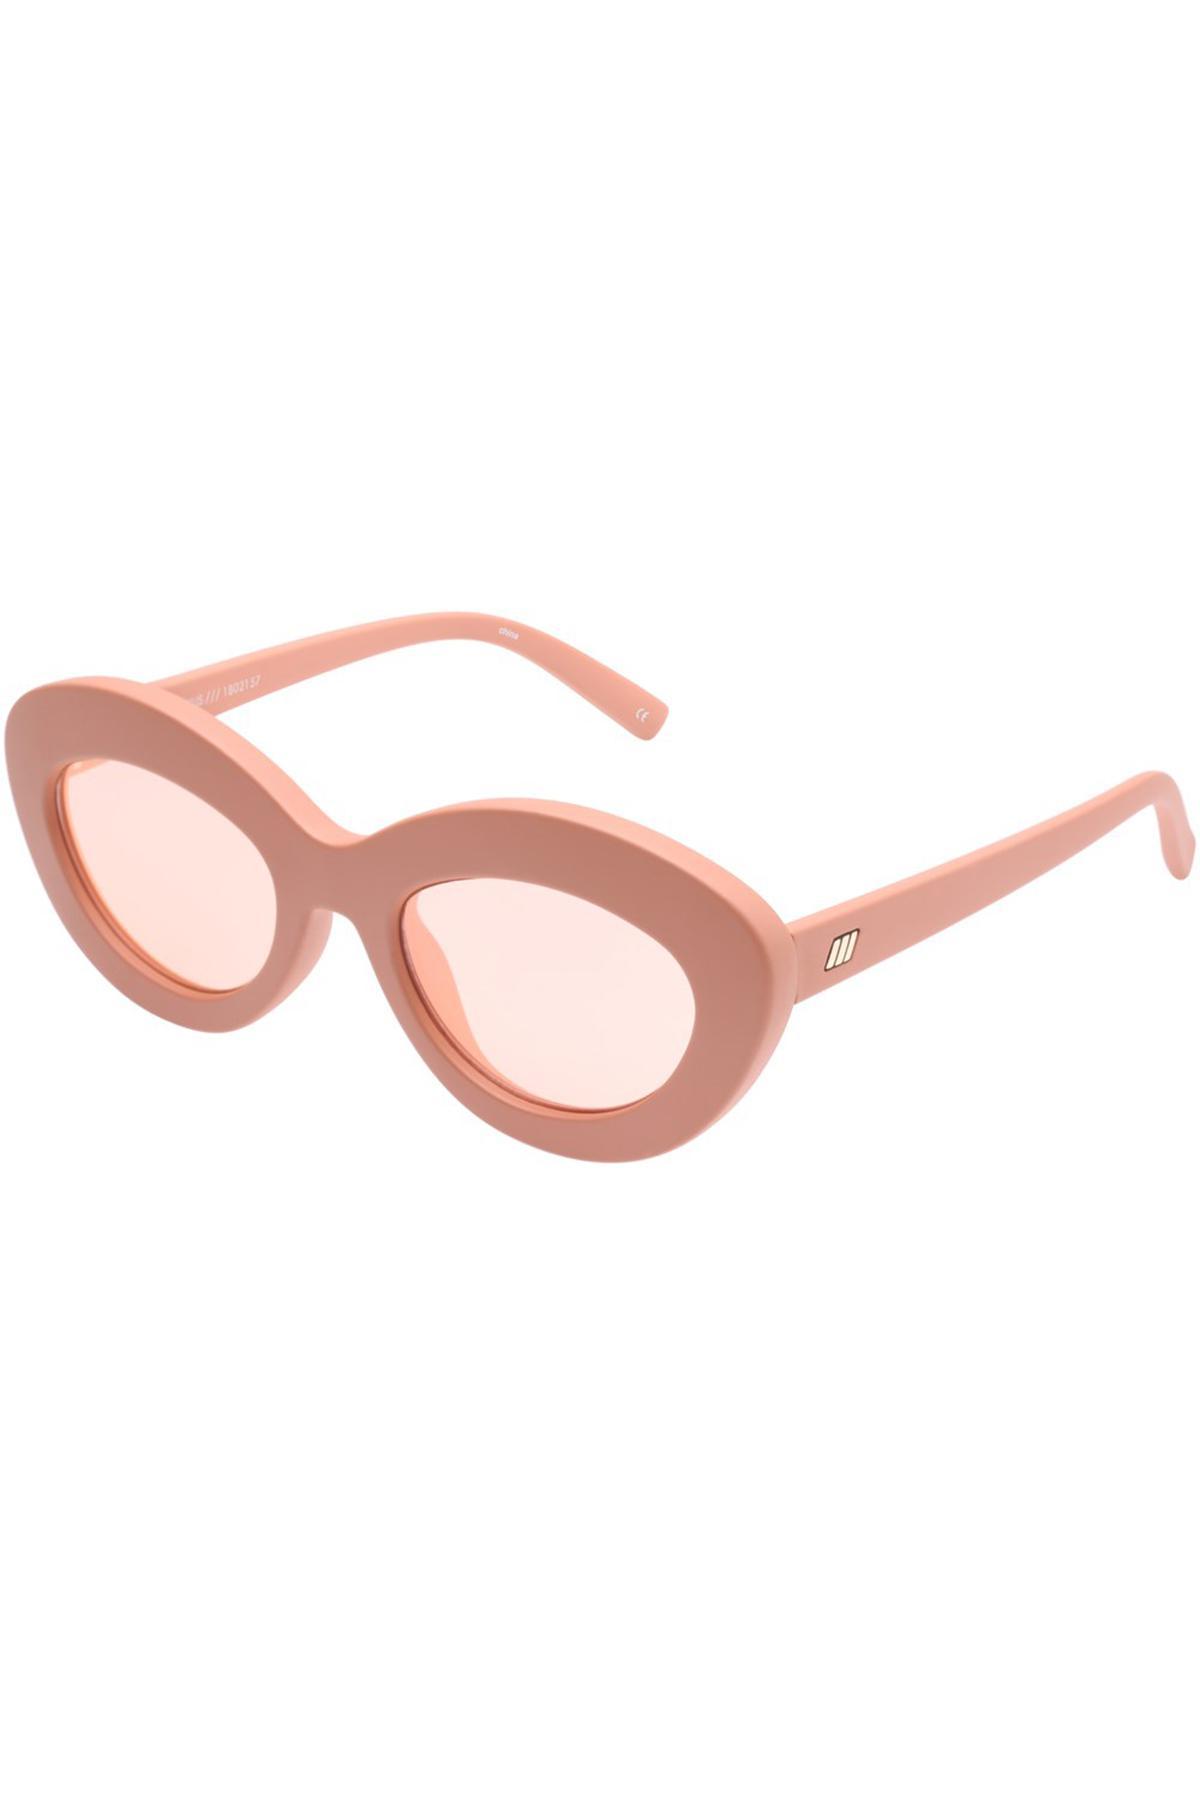 2d4ee304240 Lyst - Le Specs Fluxus Sunglasses In Matte Ginger in Pink